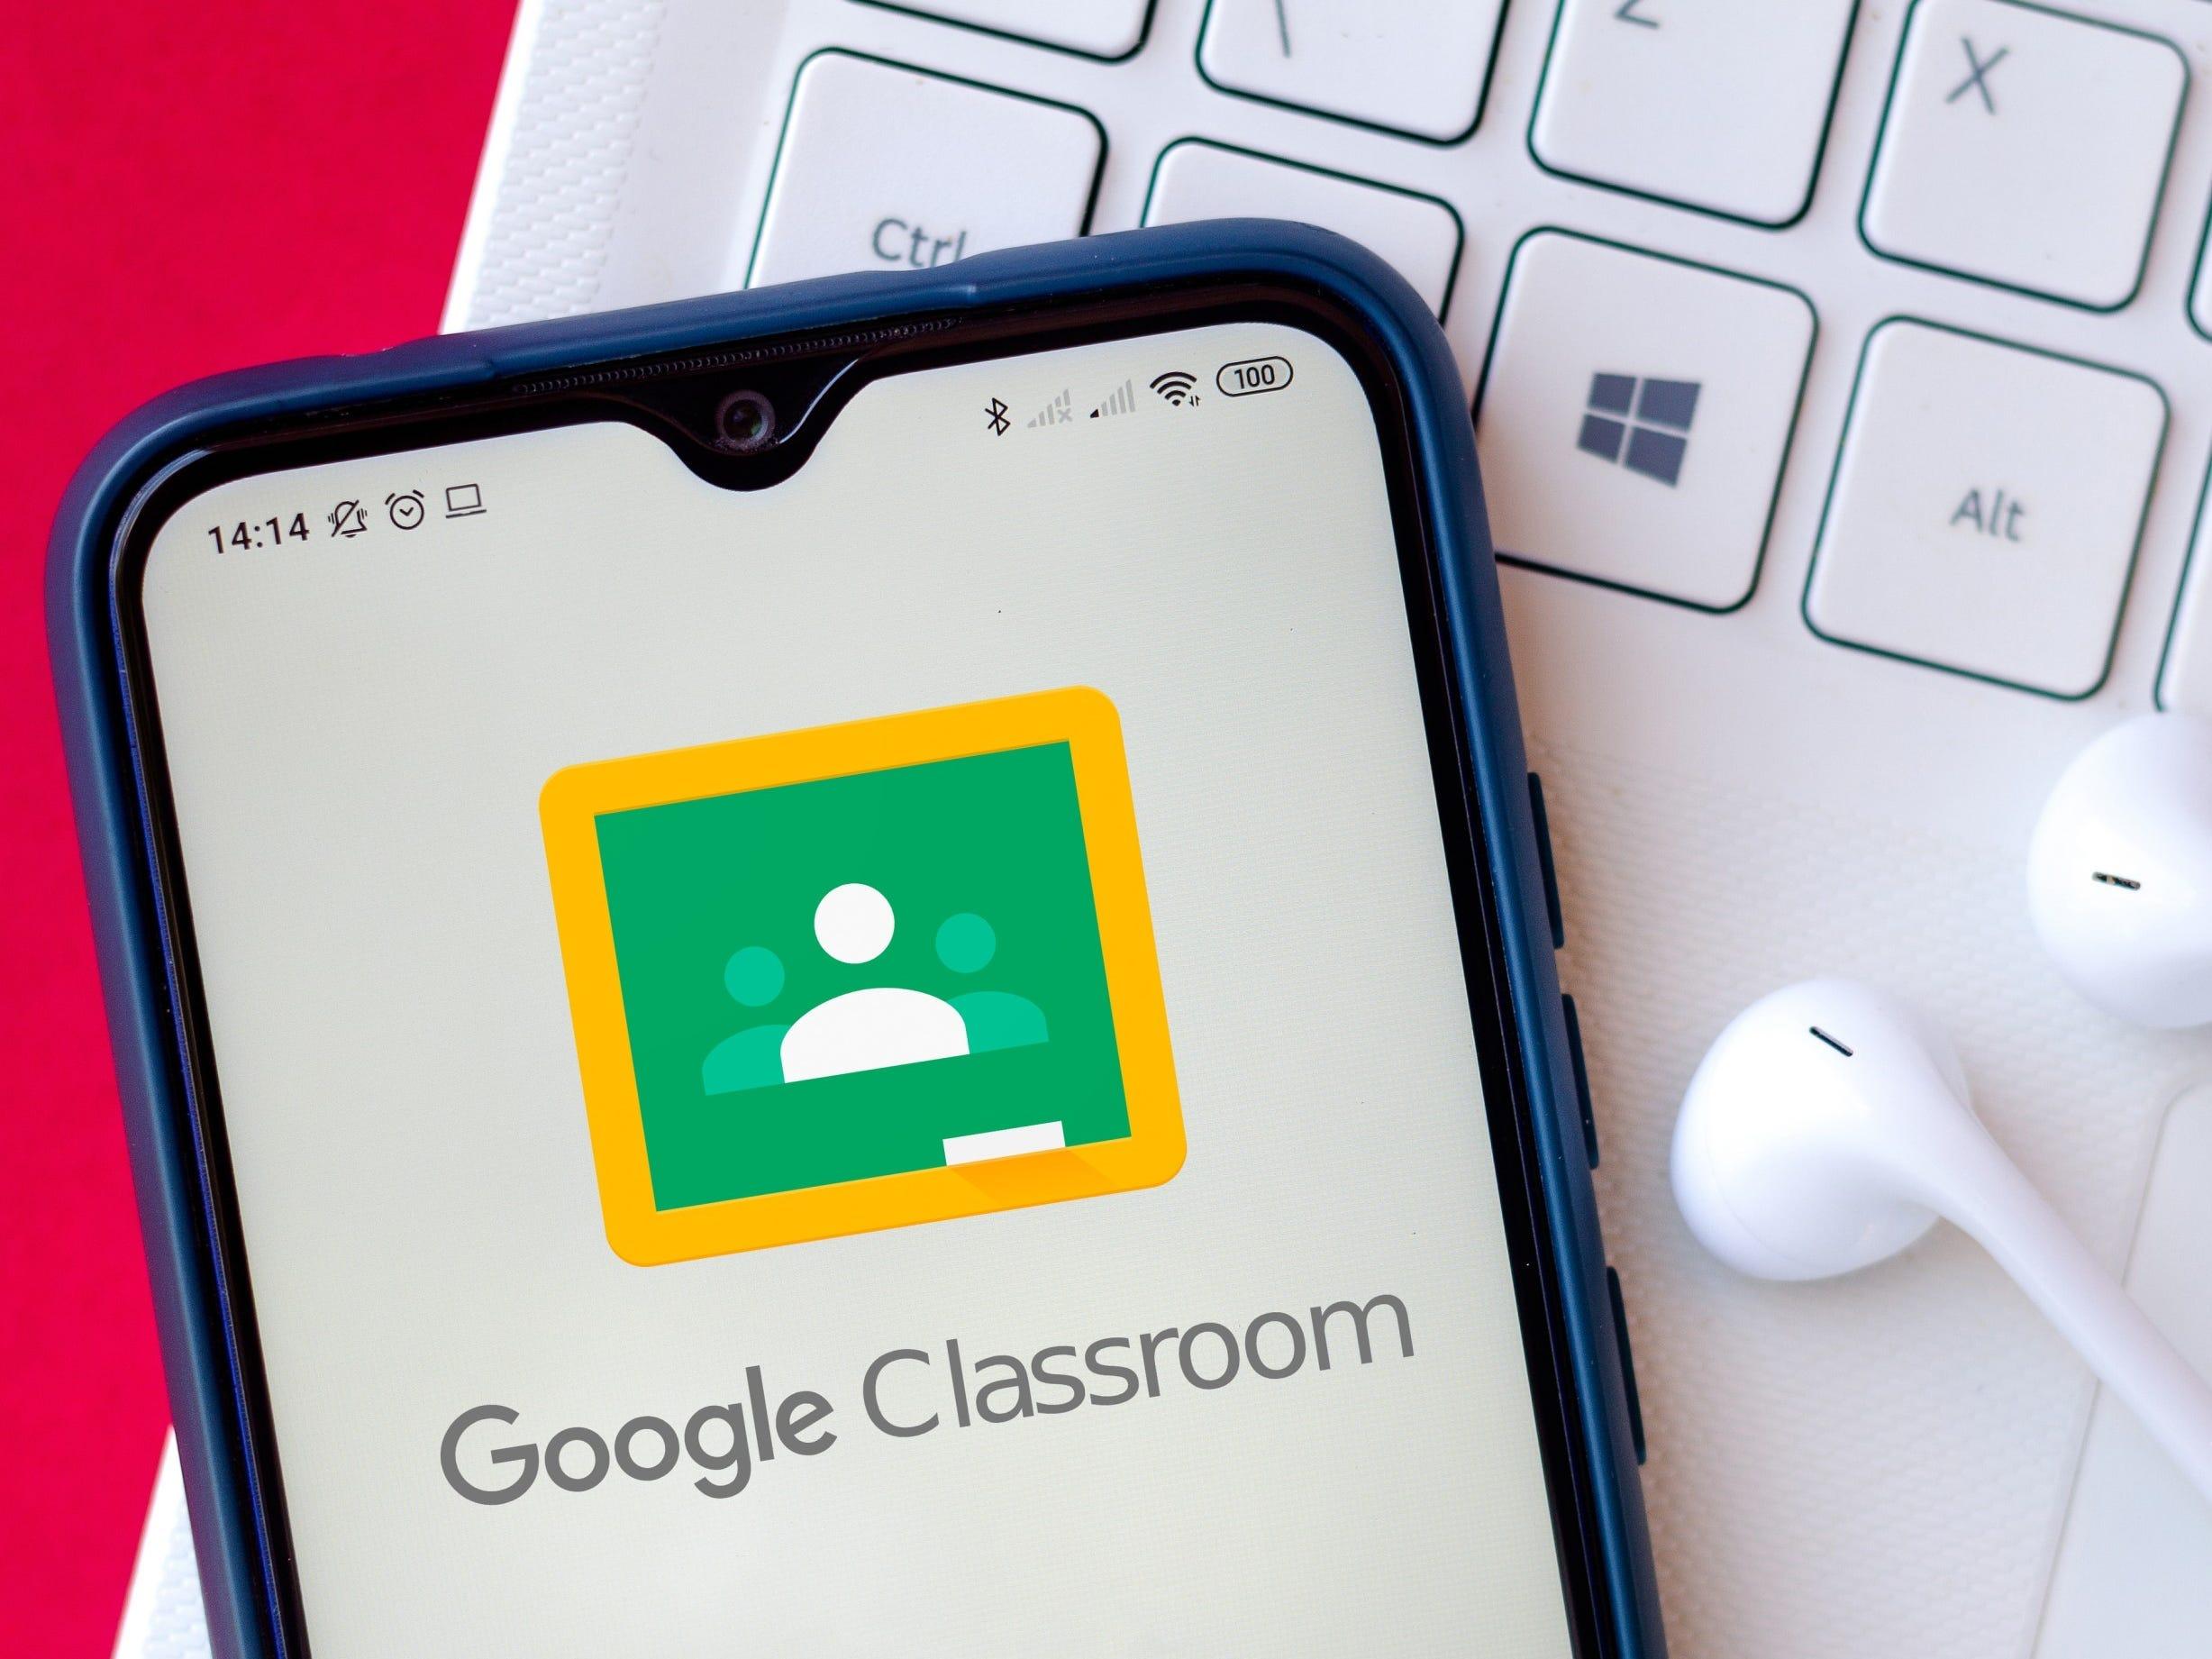 Manfaat Menggunakan Google Classroom